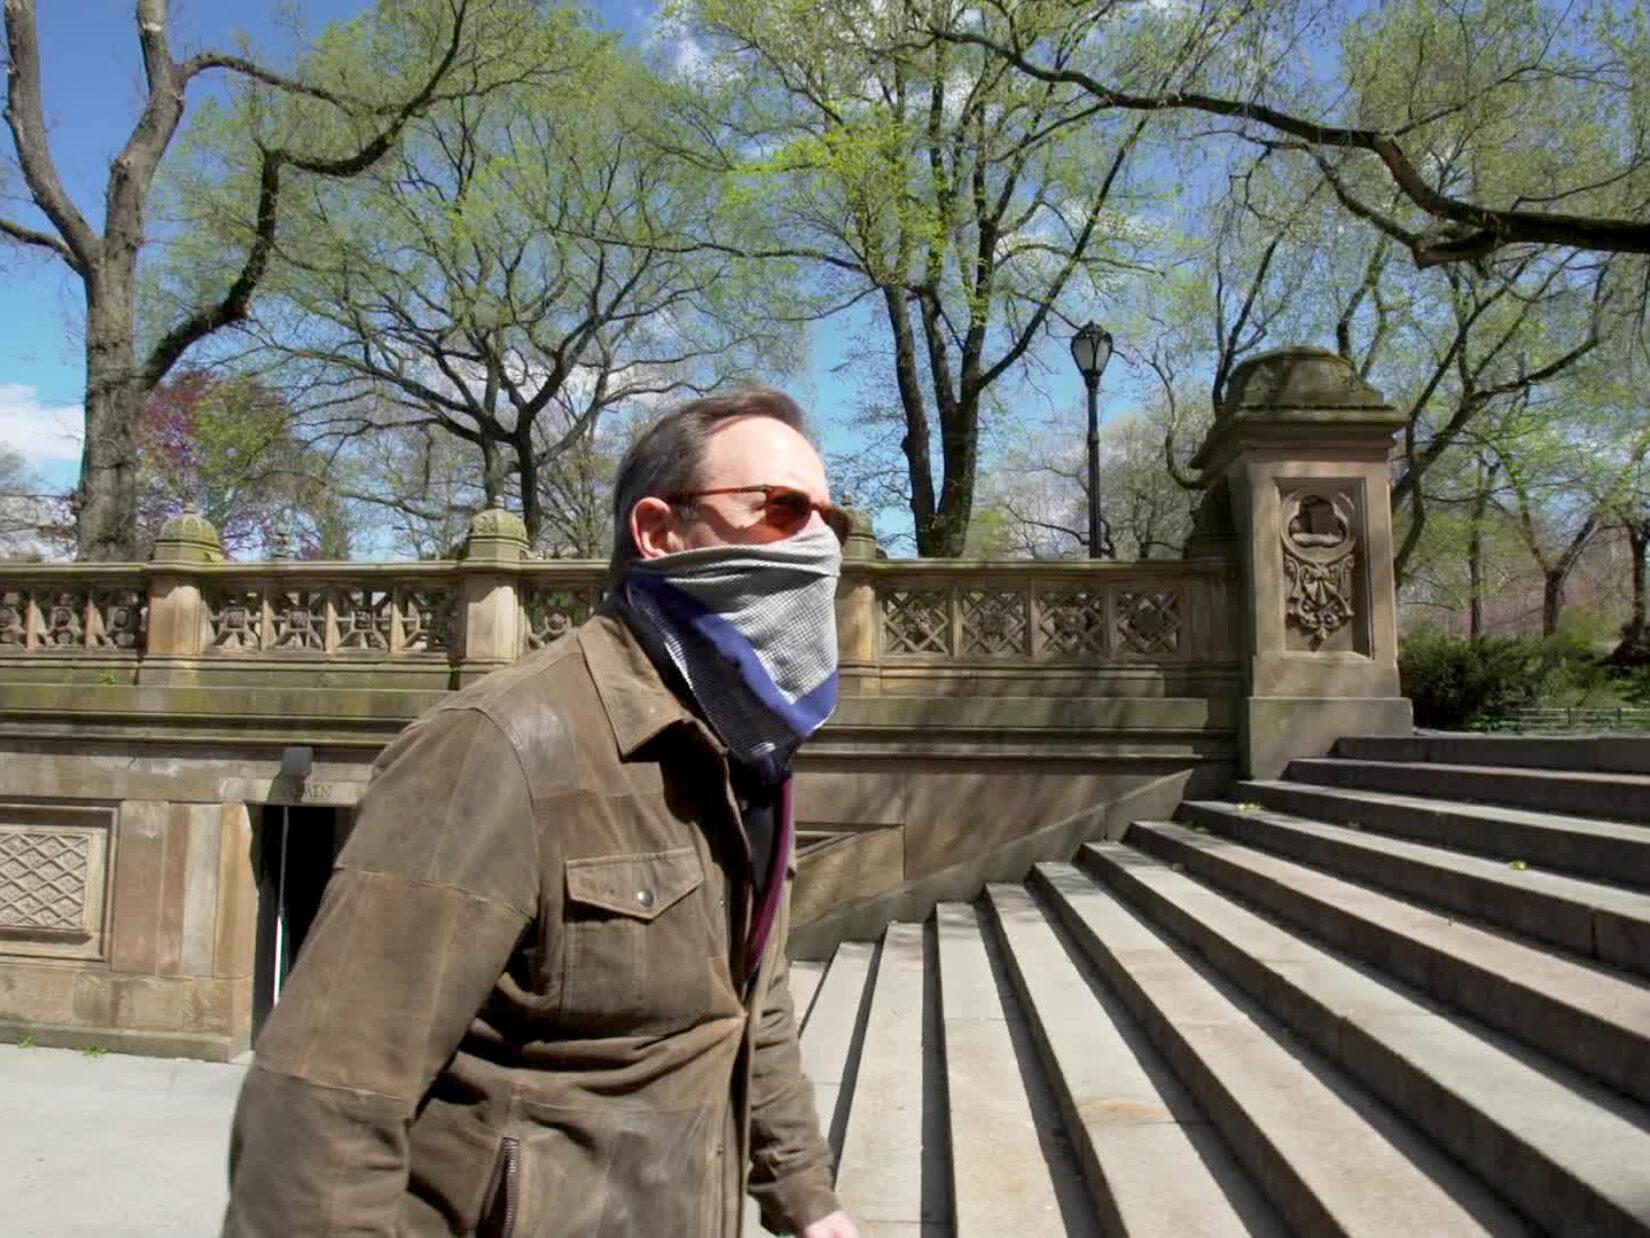 Anthony Mason walking up the stairs at Bethesda Terrace